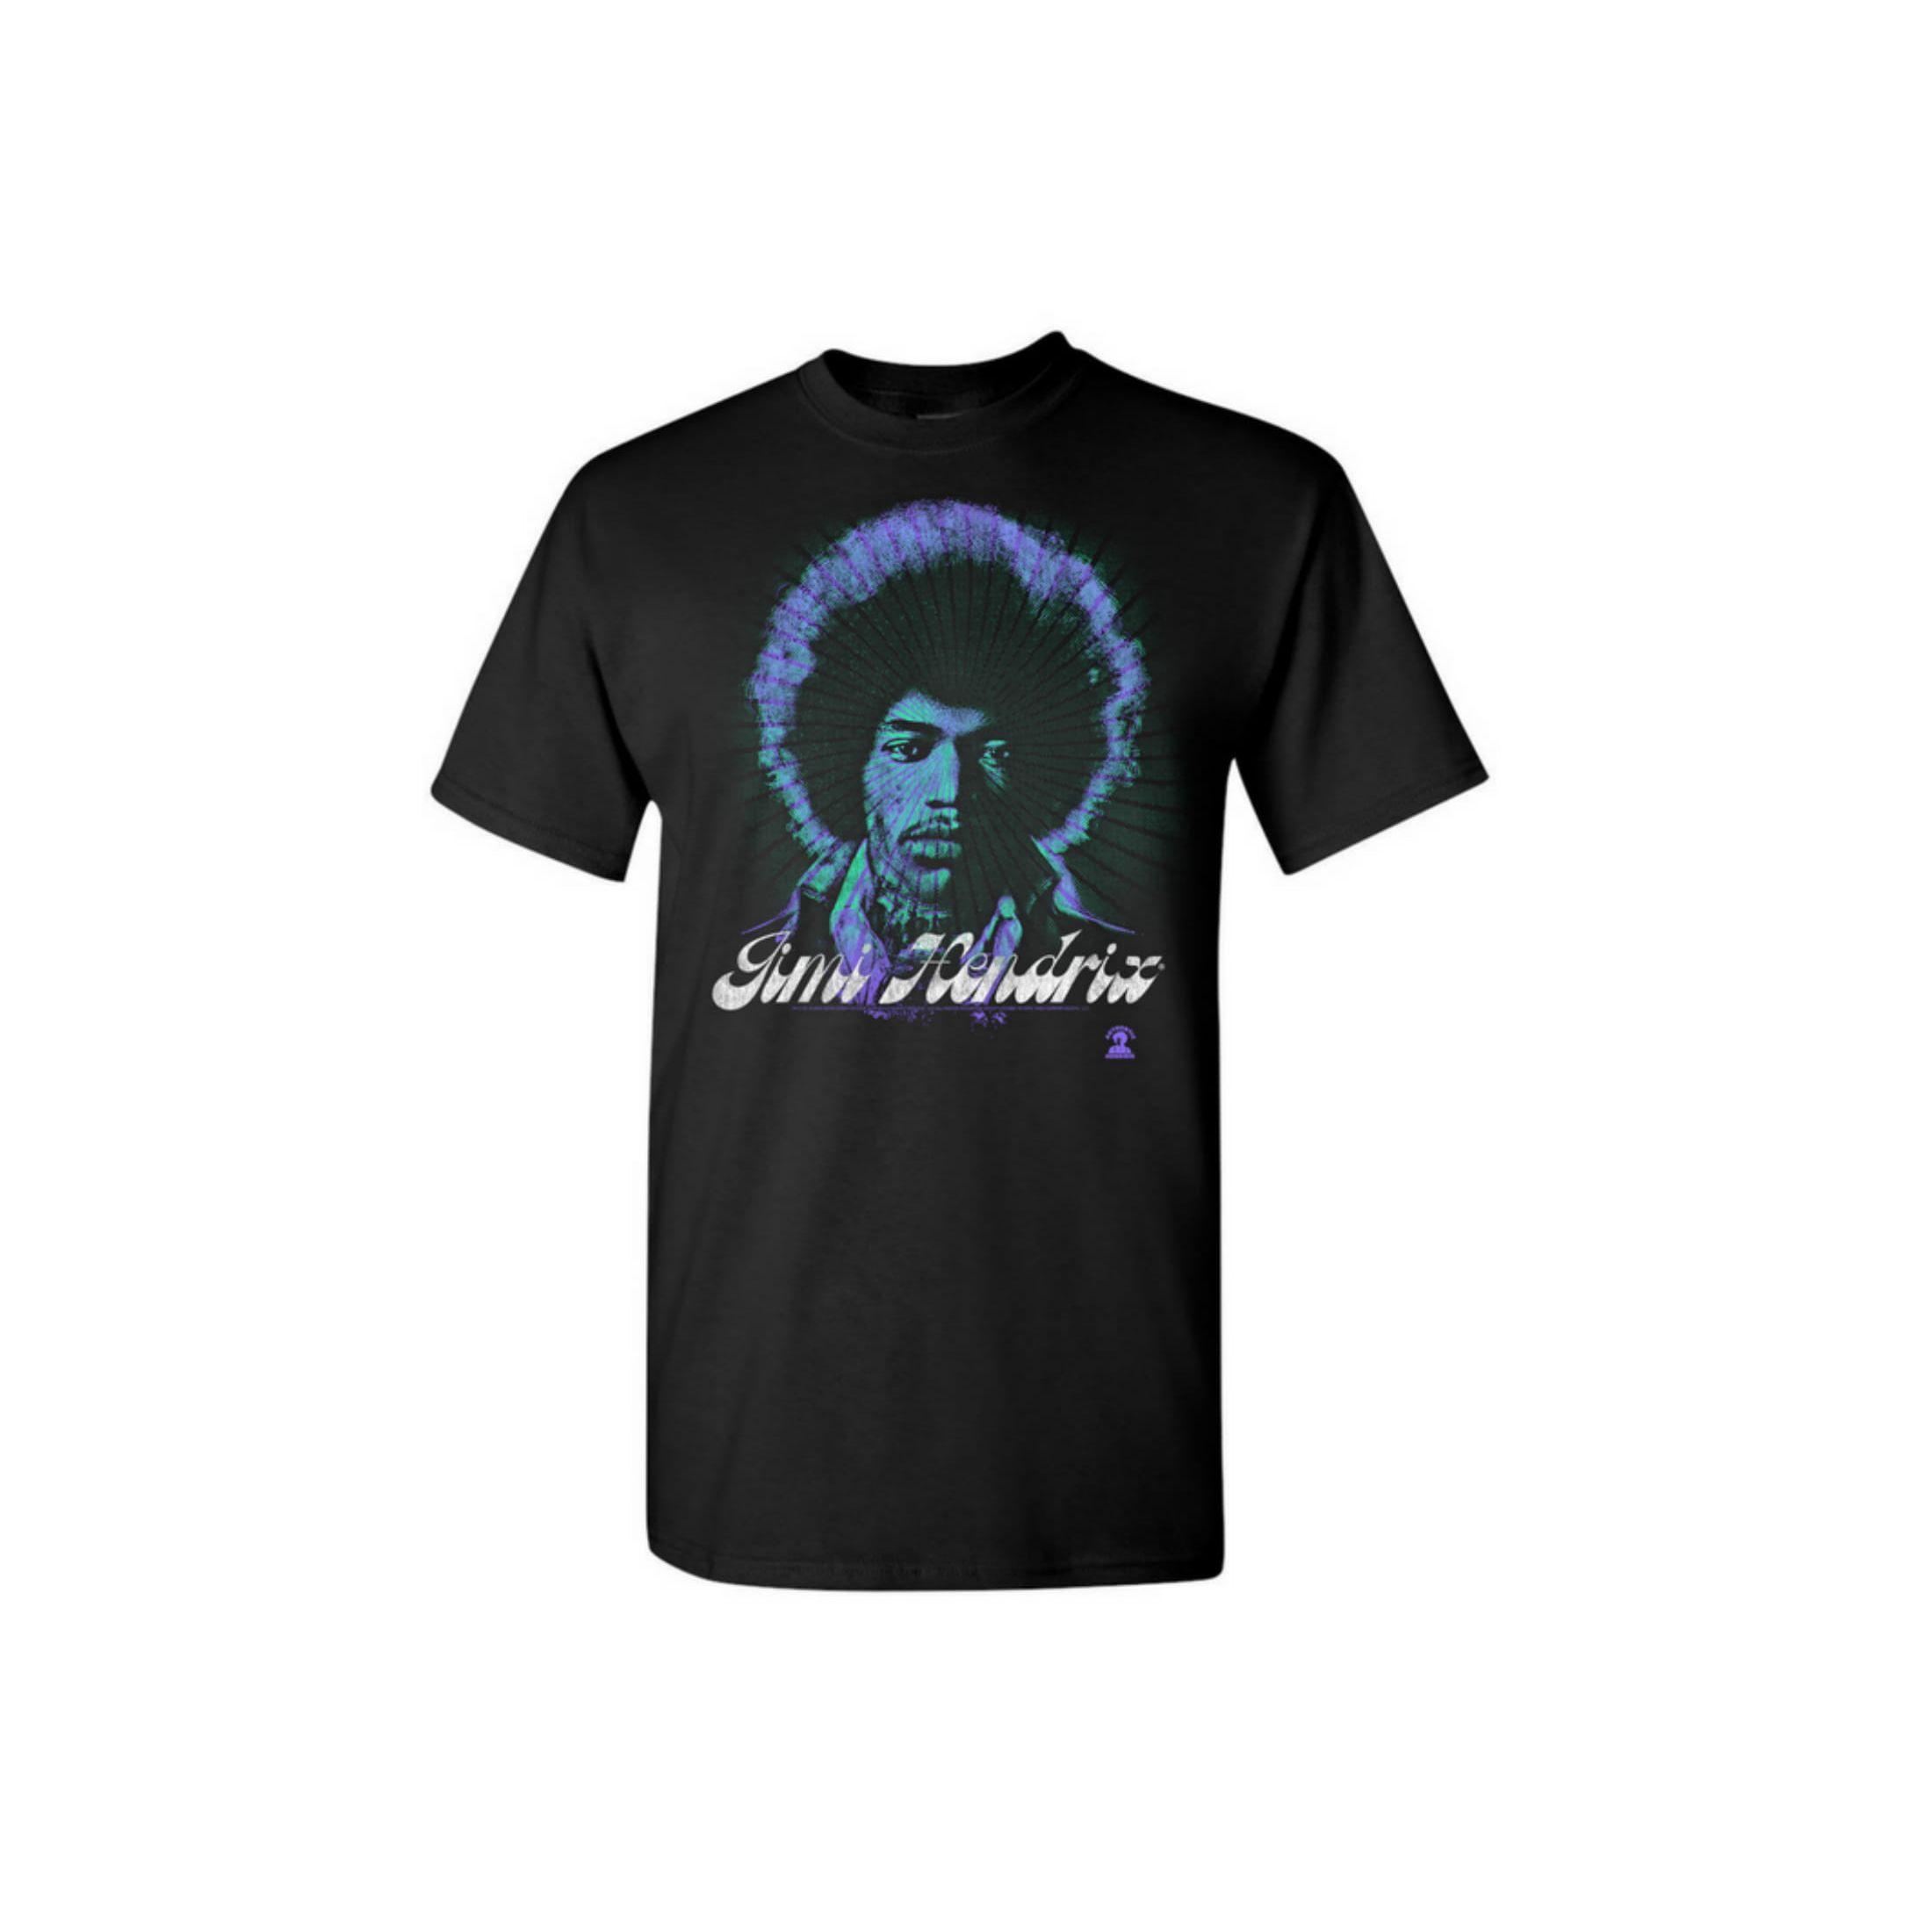 Both Sides Swirly Spine T-Shirt